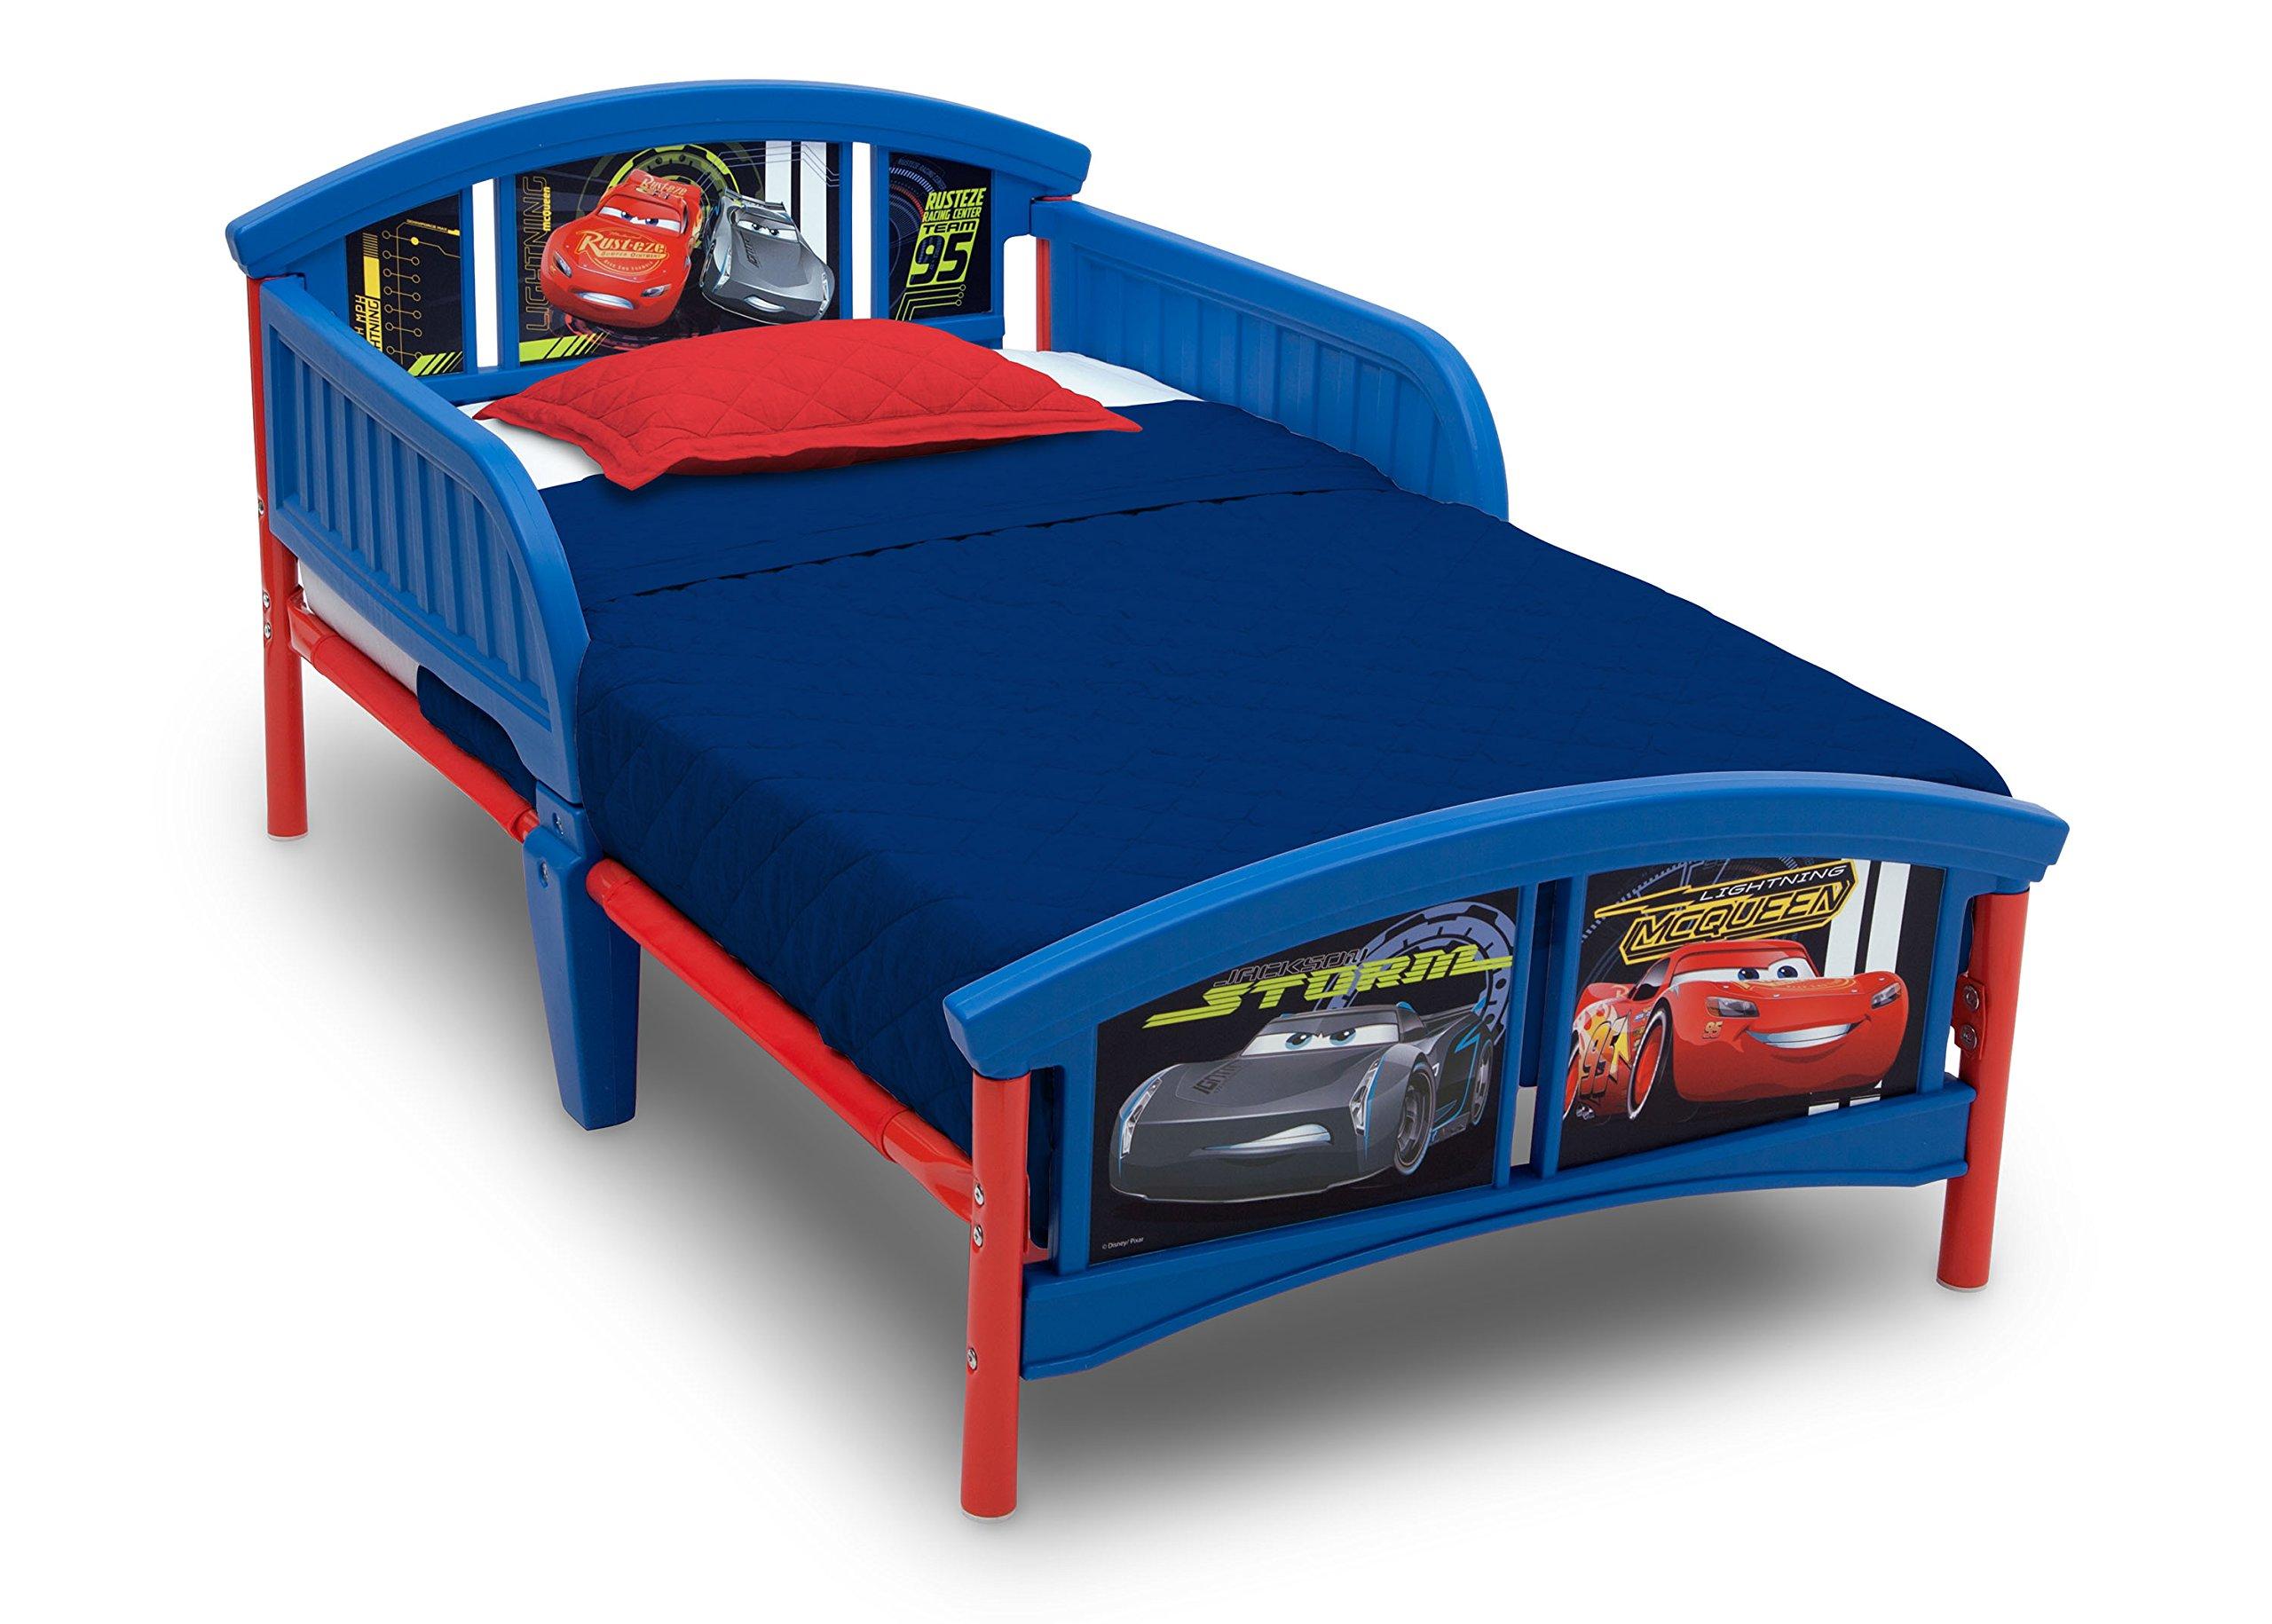 cars bedroom furniture amazon com rh amazon com Antique Car Bedroom Ideas childrens bedroom furniture cars